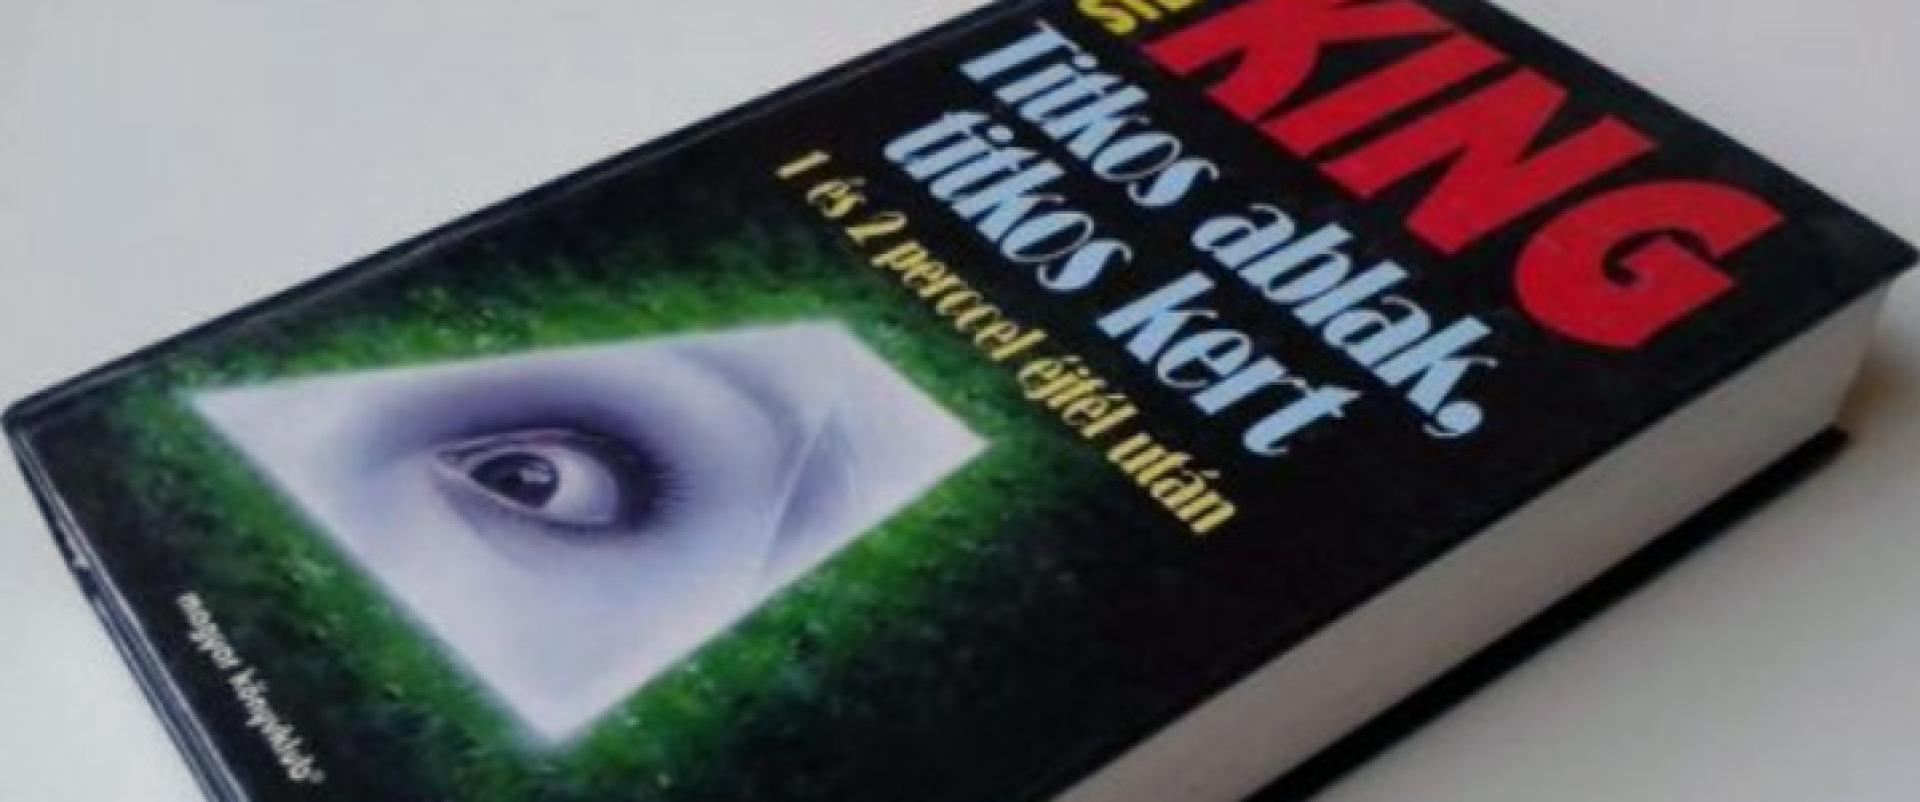 Stephen King: Secret Window, Secret Garden - Titkos ablak, titkos kert (1990)